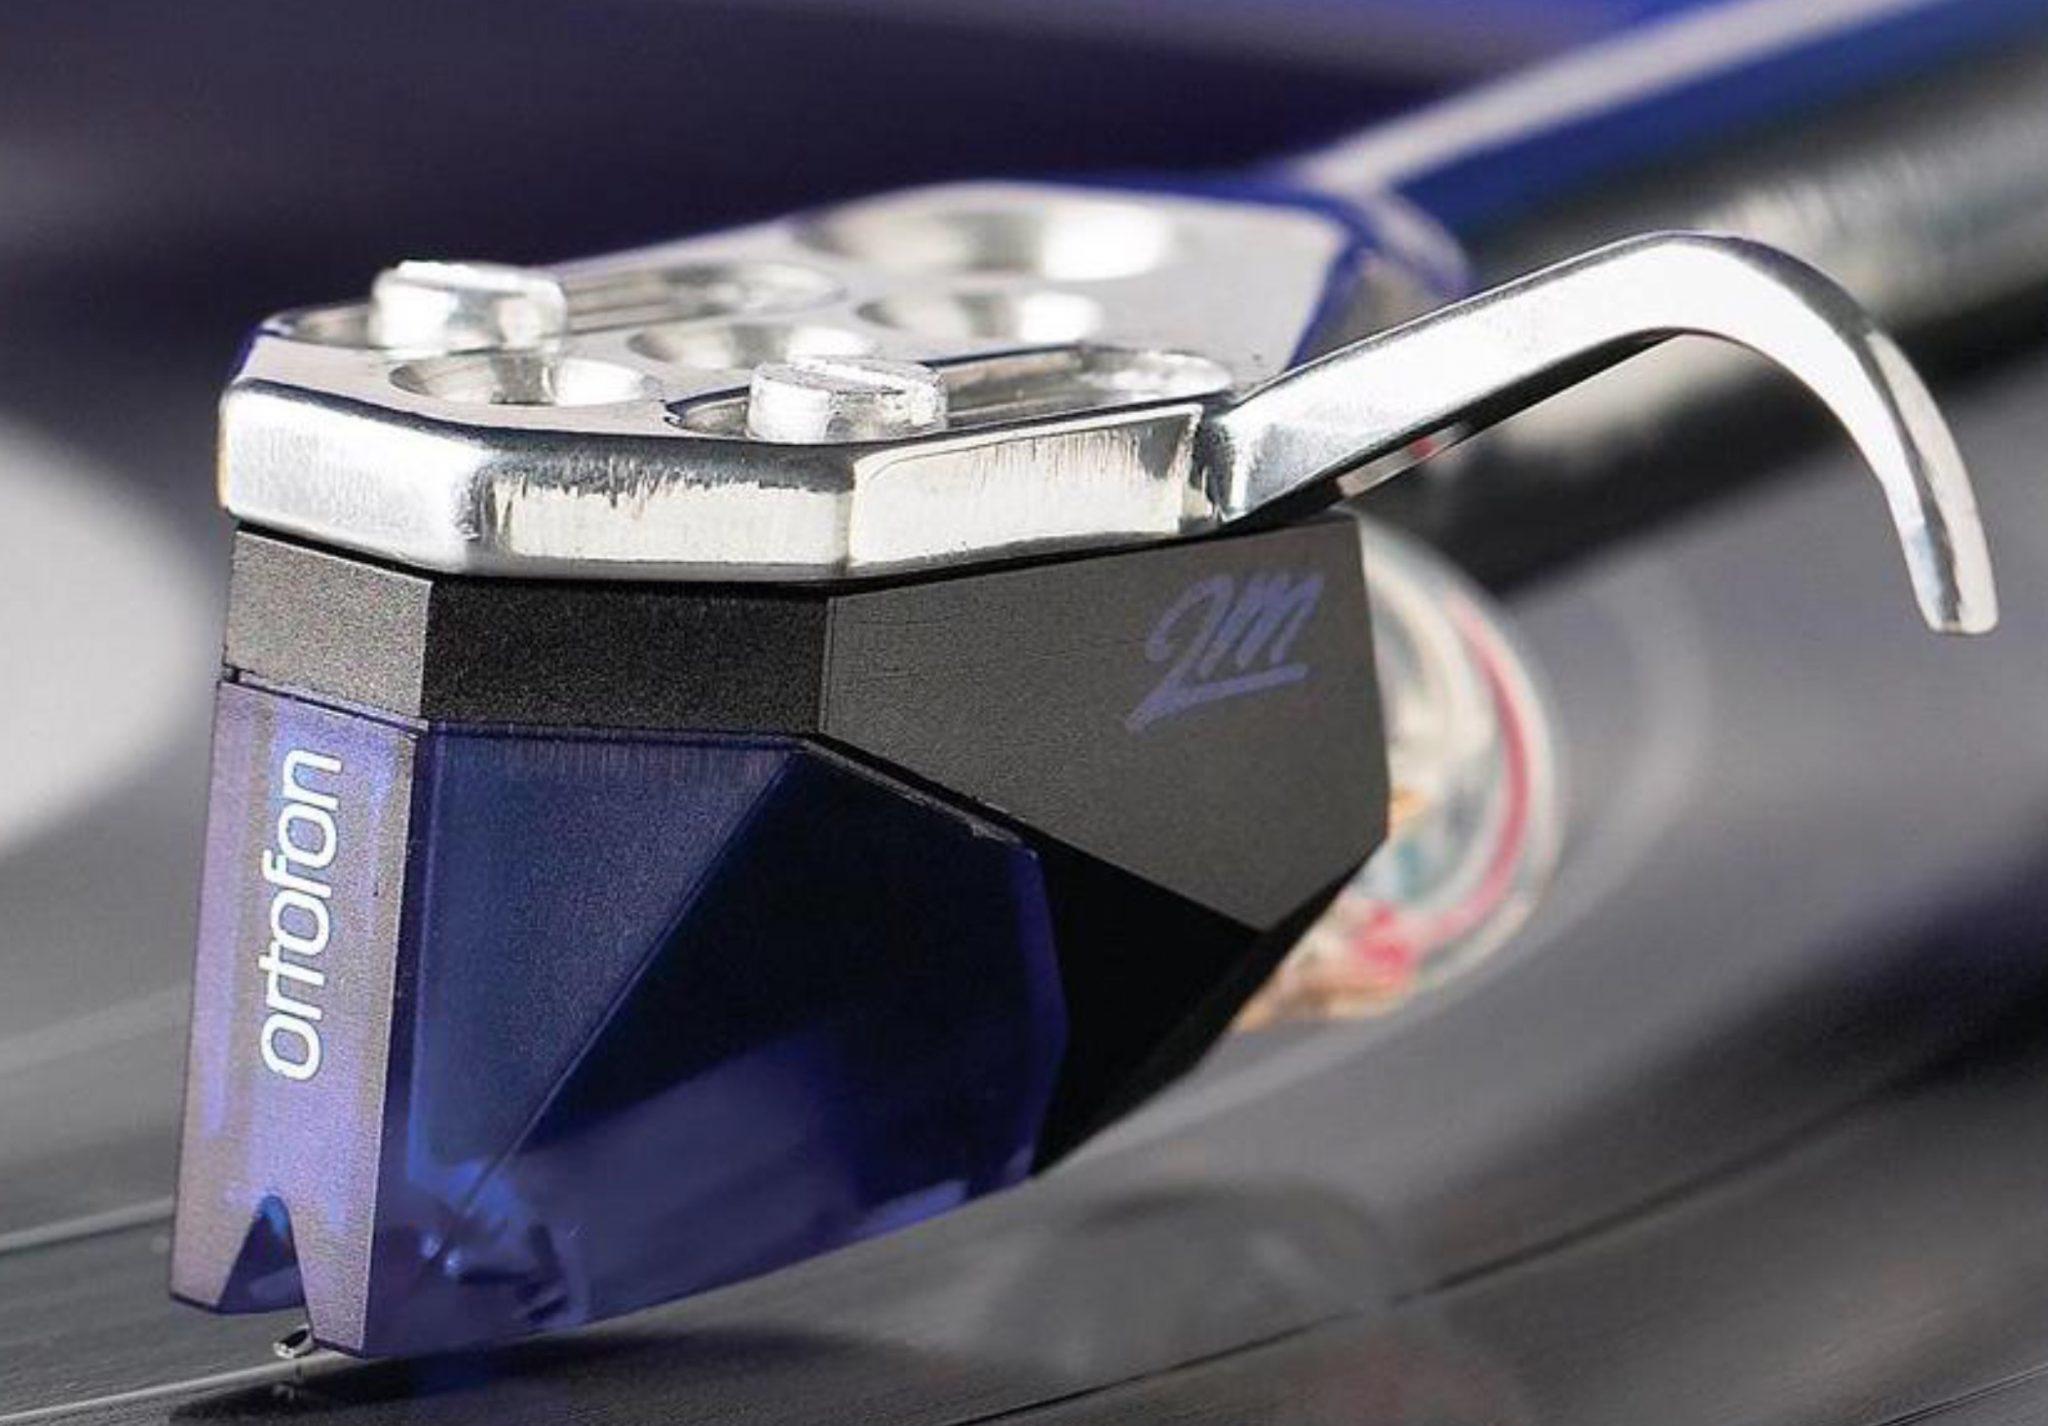 2M Blue 100 Stylus from Ortofon - The Audiophile Man